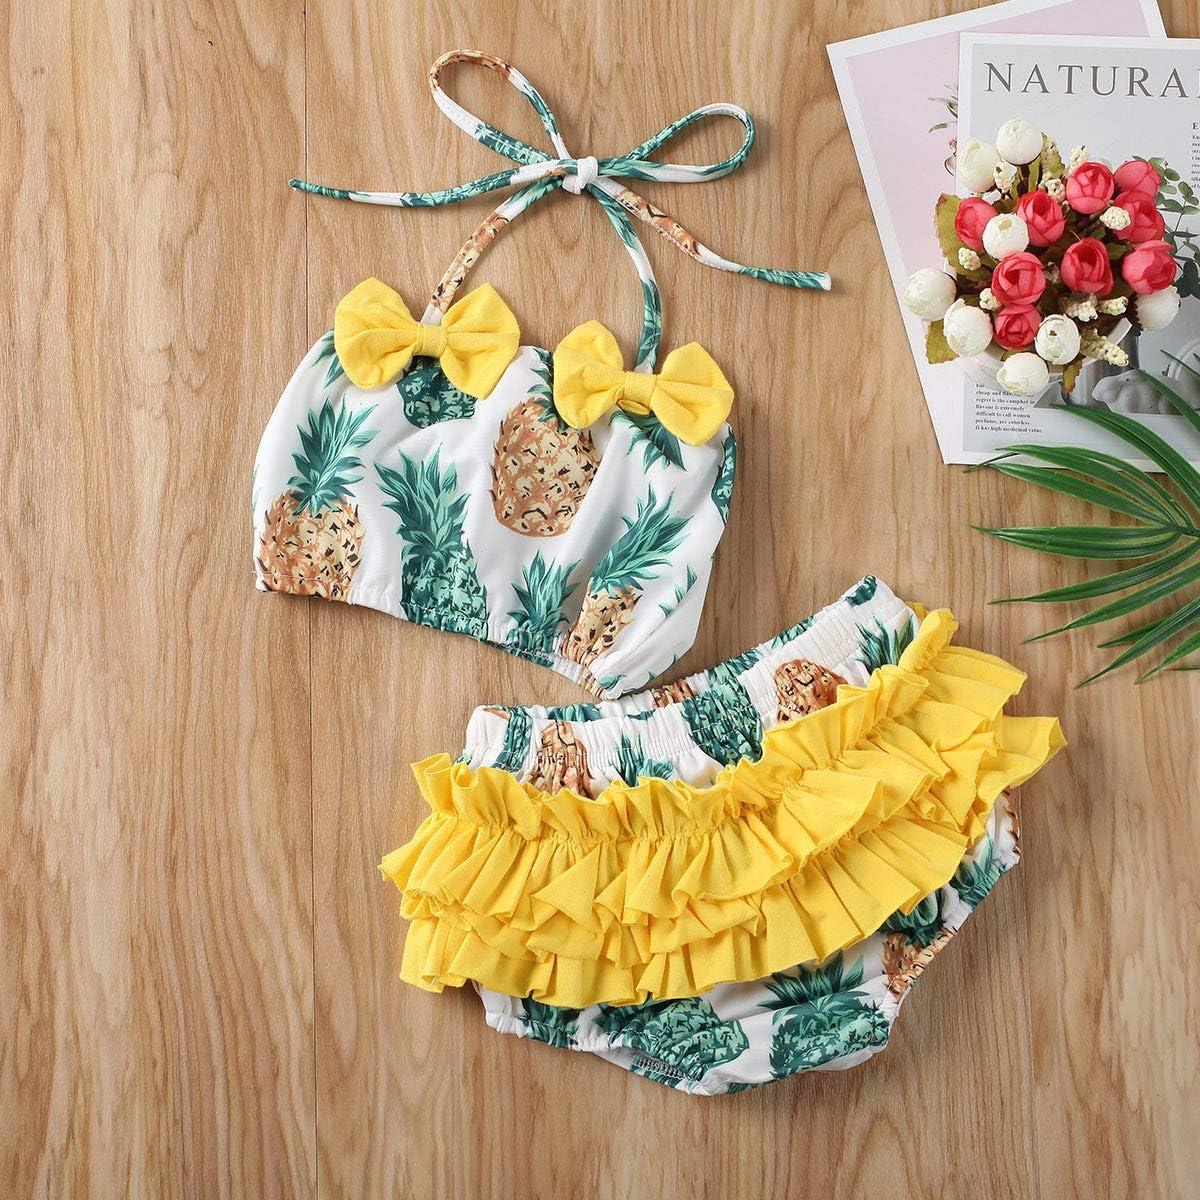 Toddler Baby Girl Swimsuit Two Pieces Tankini Sets Tassel Bathing Suit Bikini Swimwear Beachwear with Headband